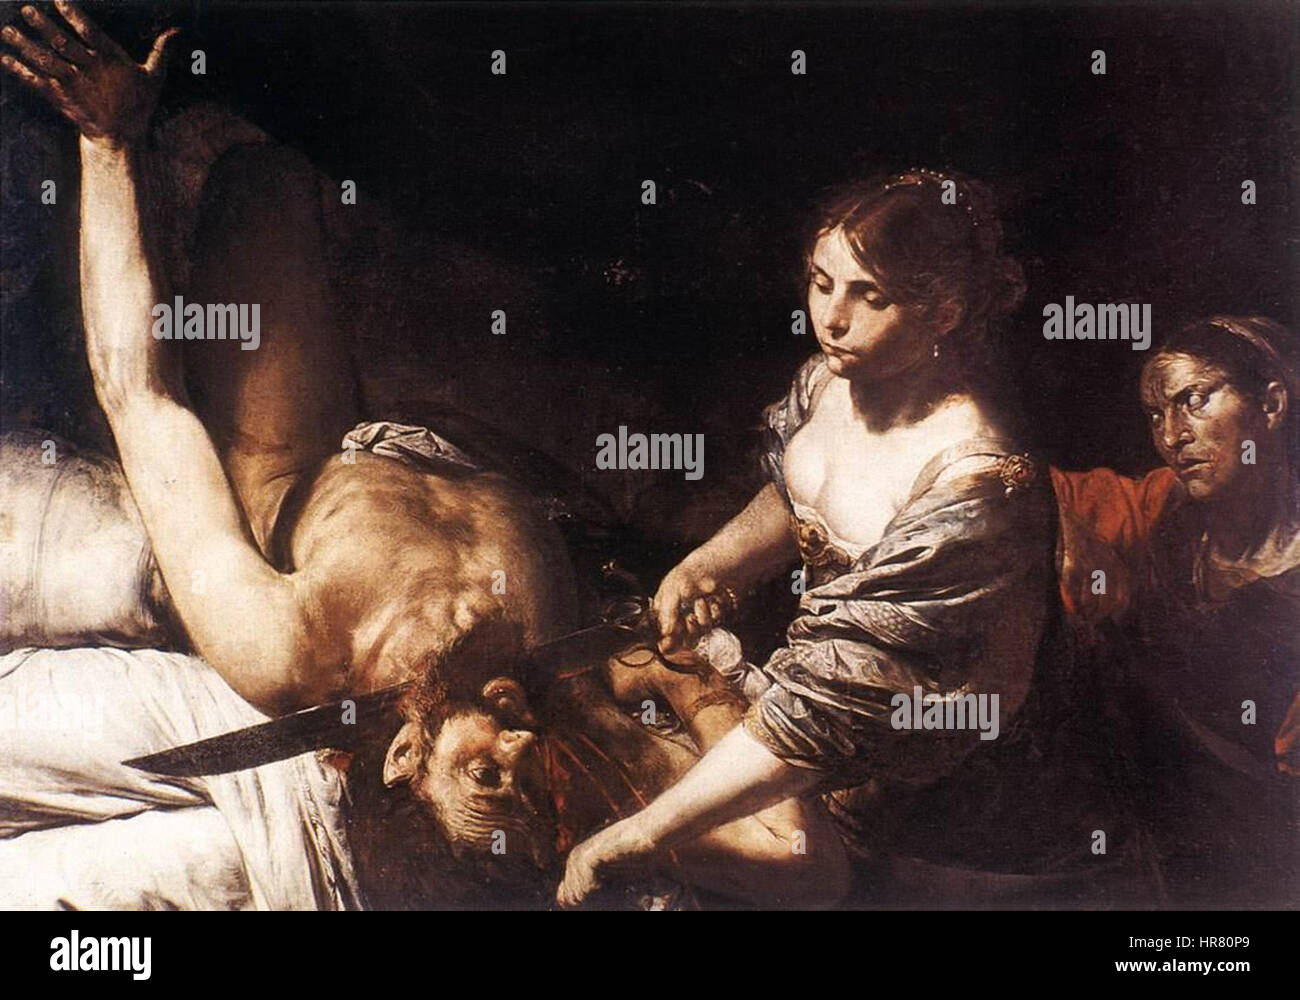 Valentin de Boulogne - Judith and Holofernes - WGA24242 - Stock Image